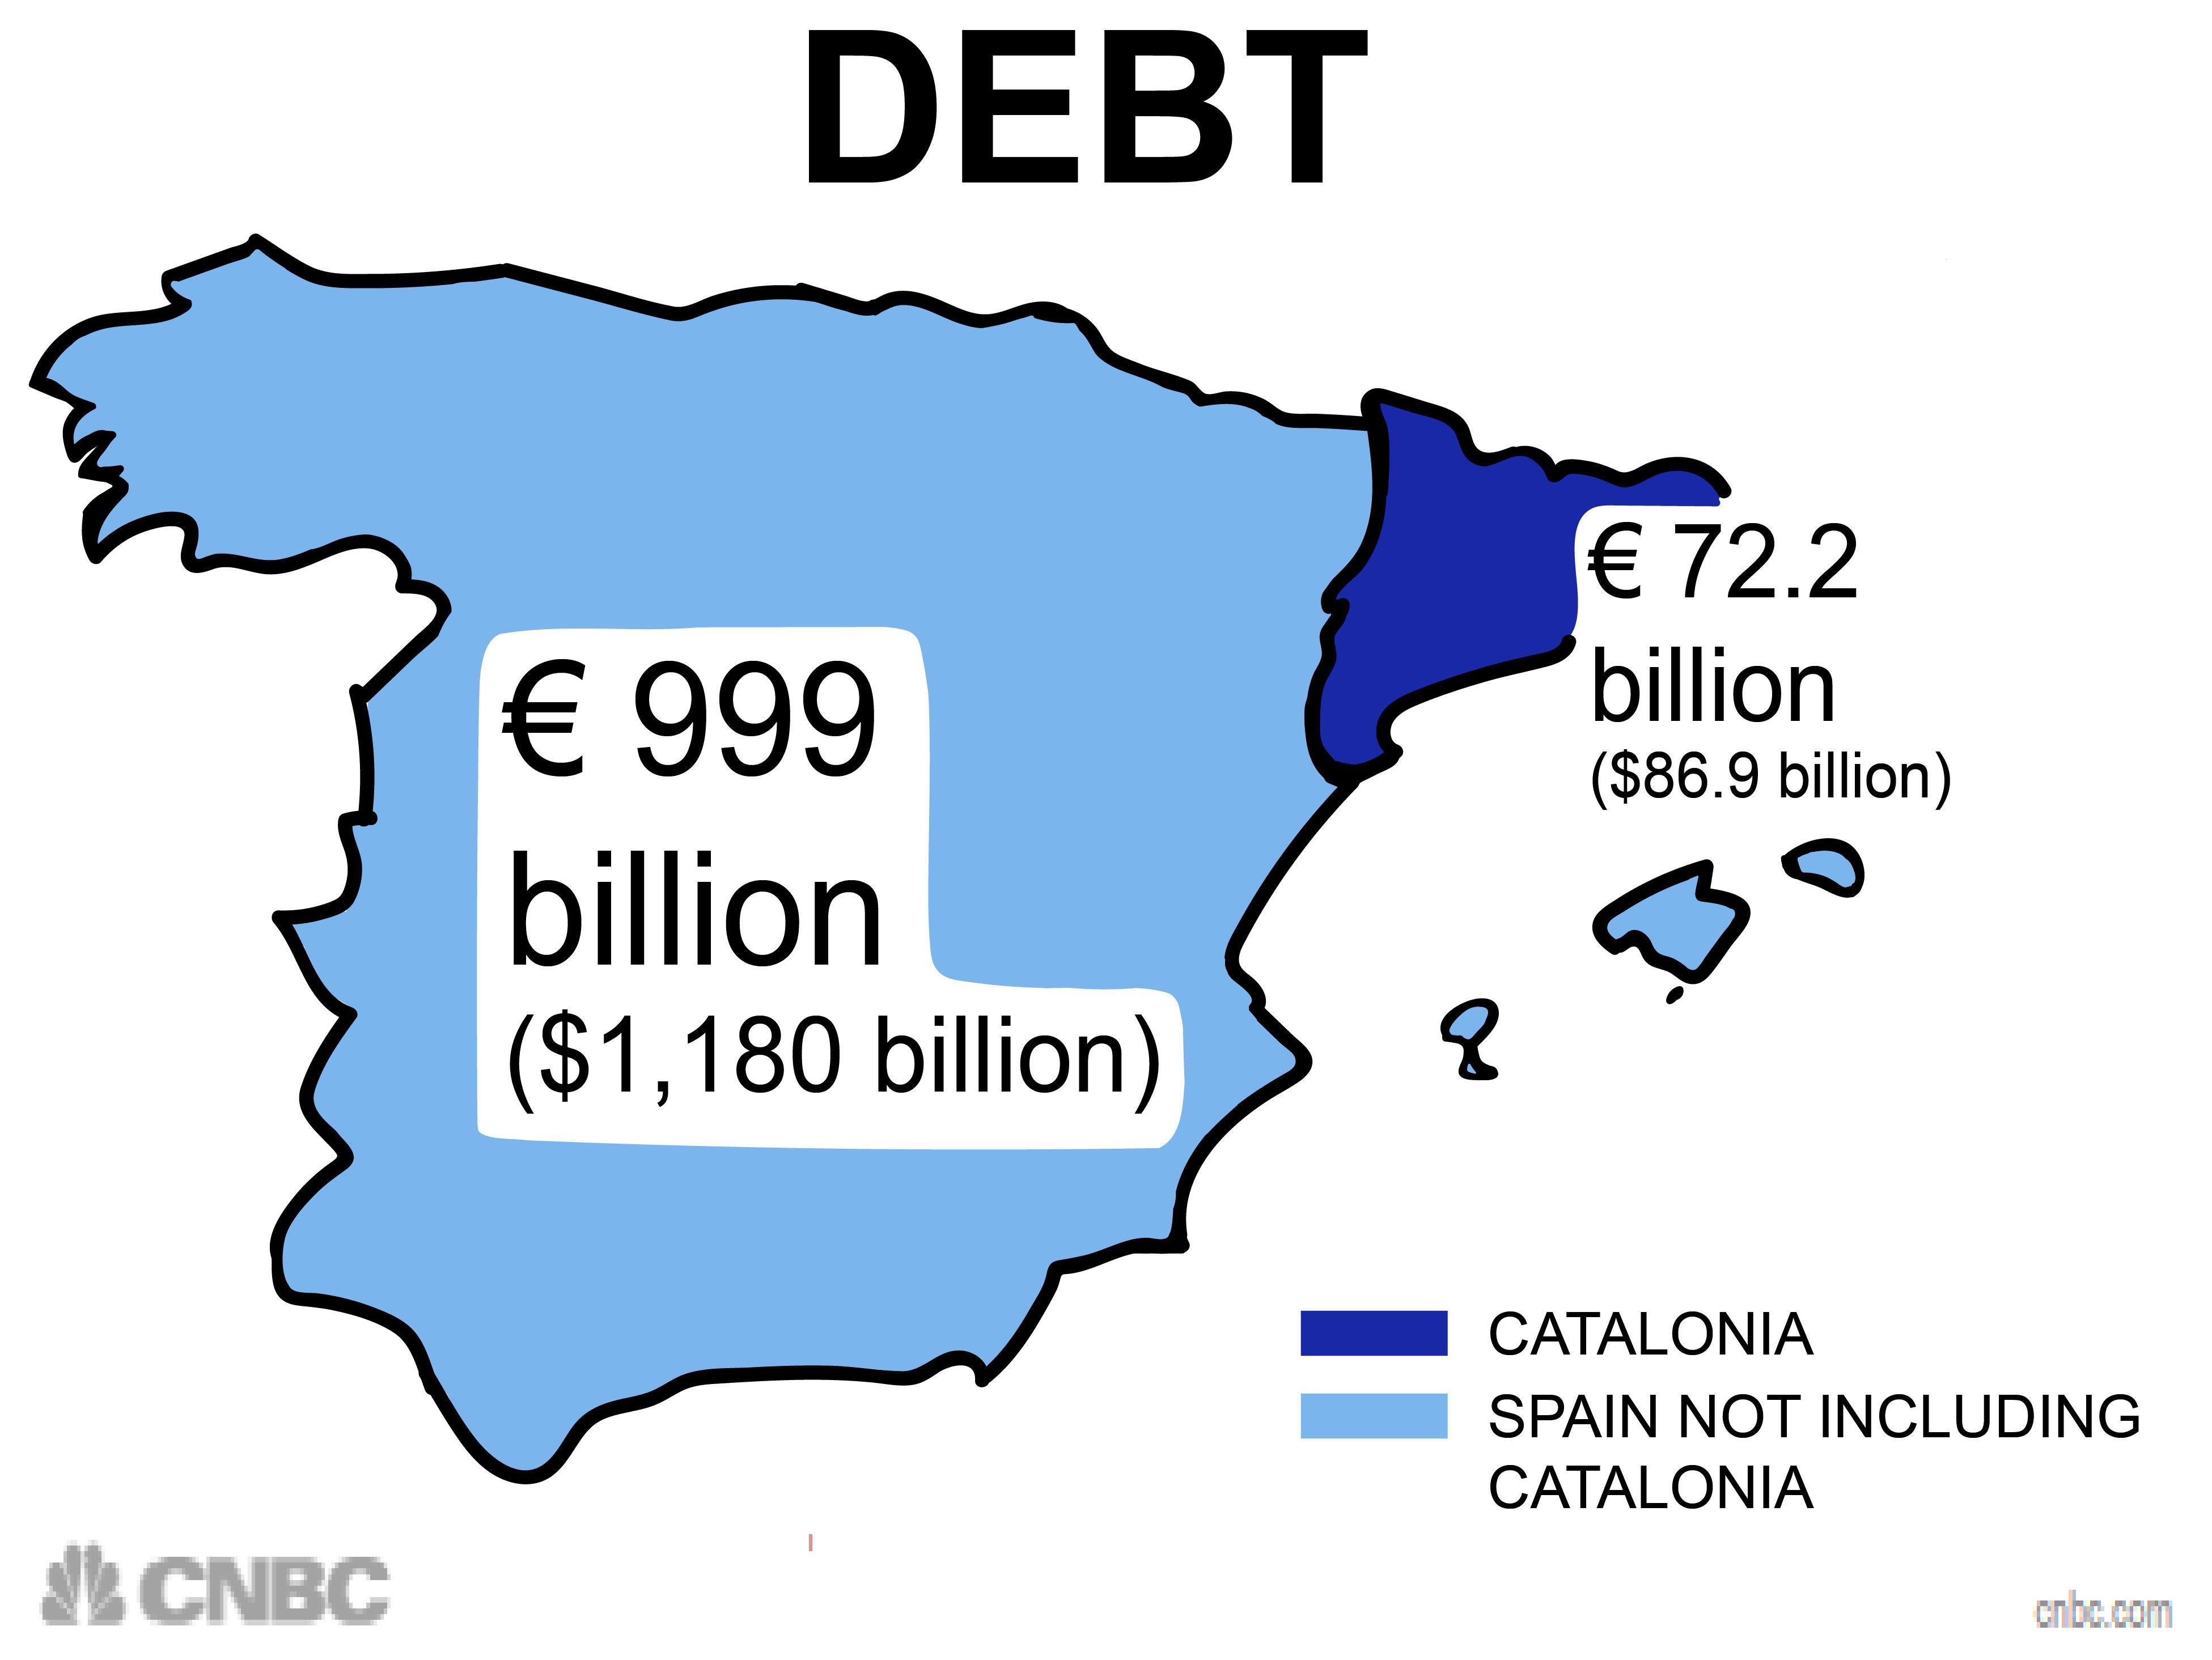 Debt Catalonia